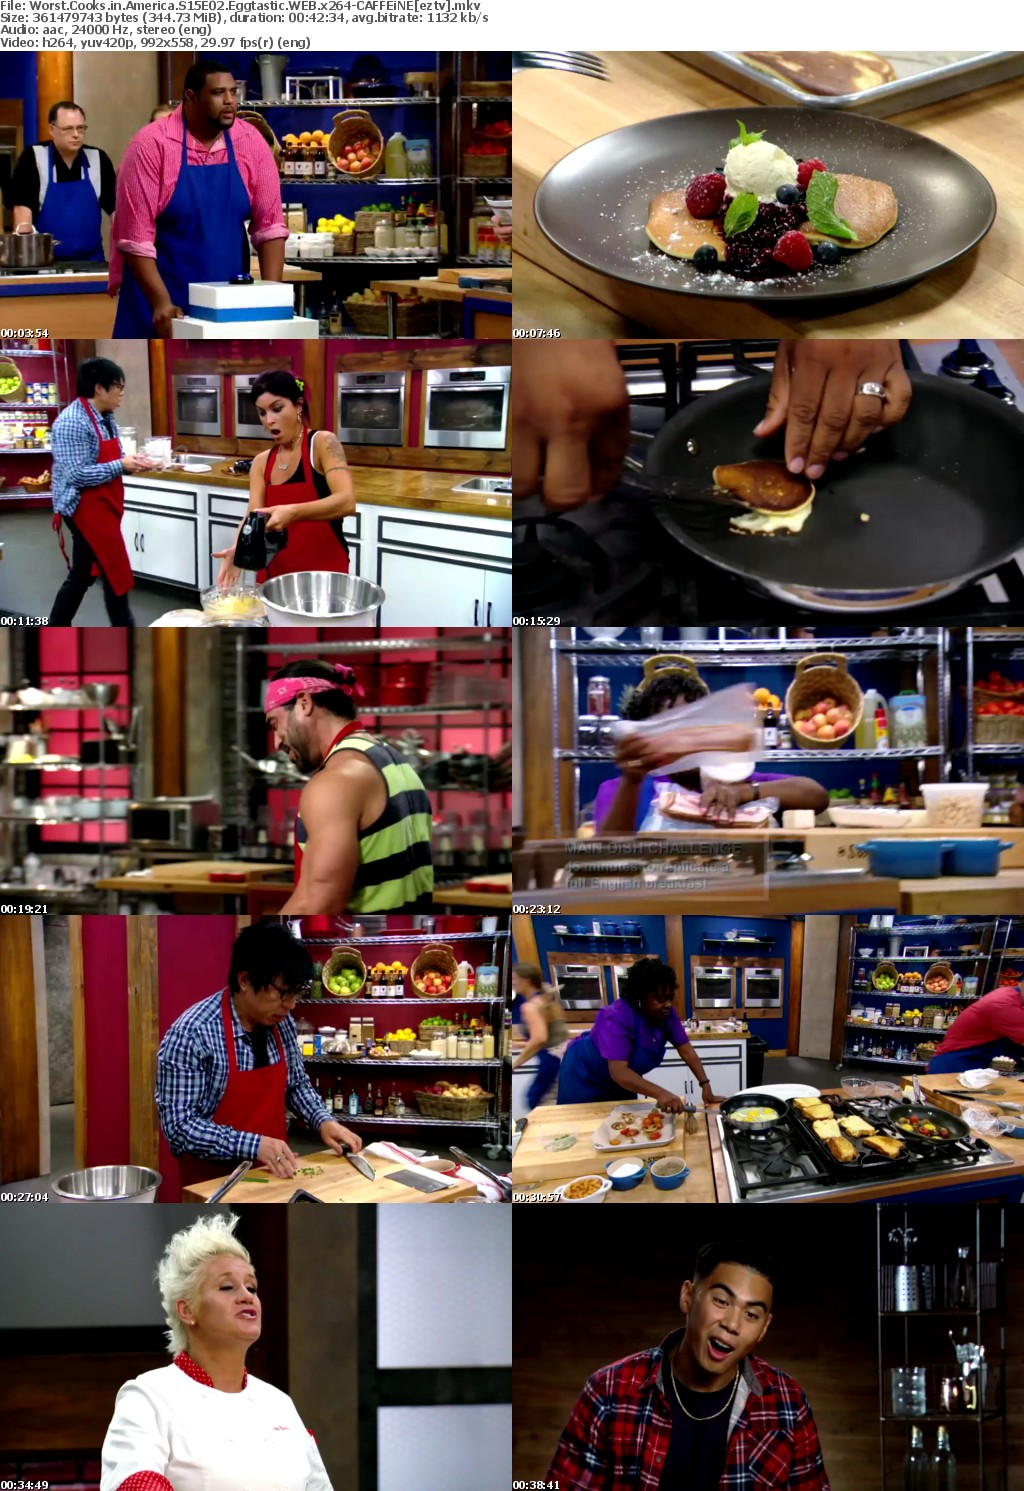 Worst Cooks in America S15E02 Eggtastic WEB x264-CAFFEiNE